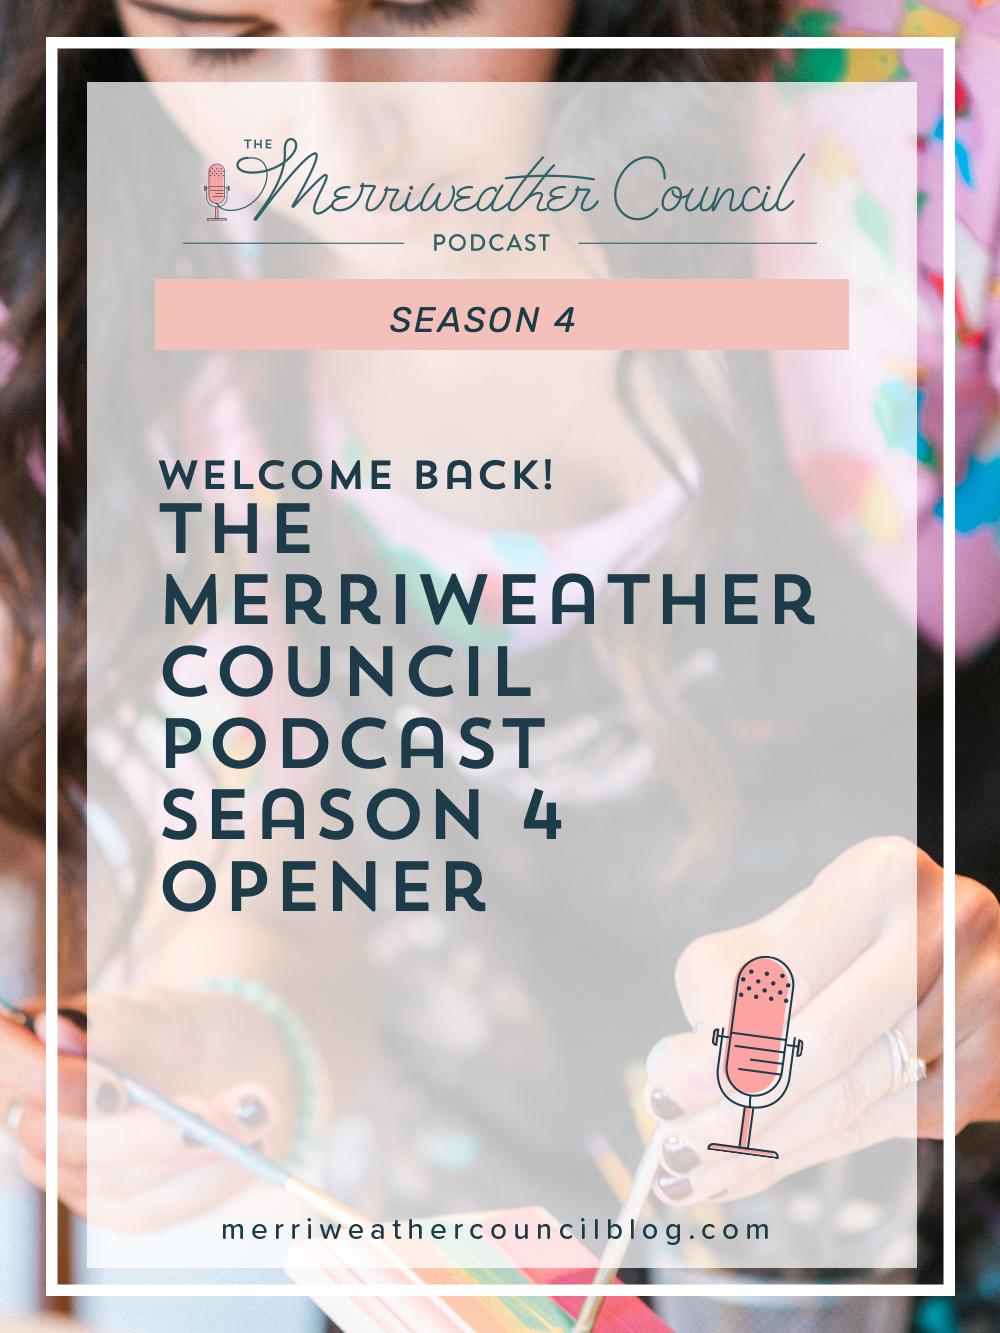 The Merriweather Council Podcast Season 4 Opener